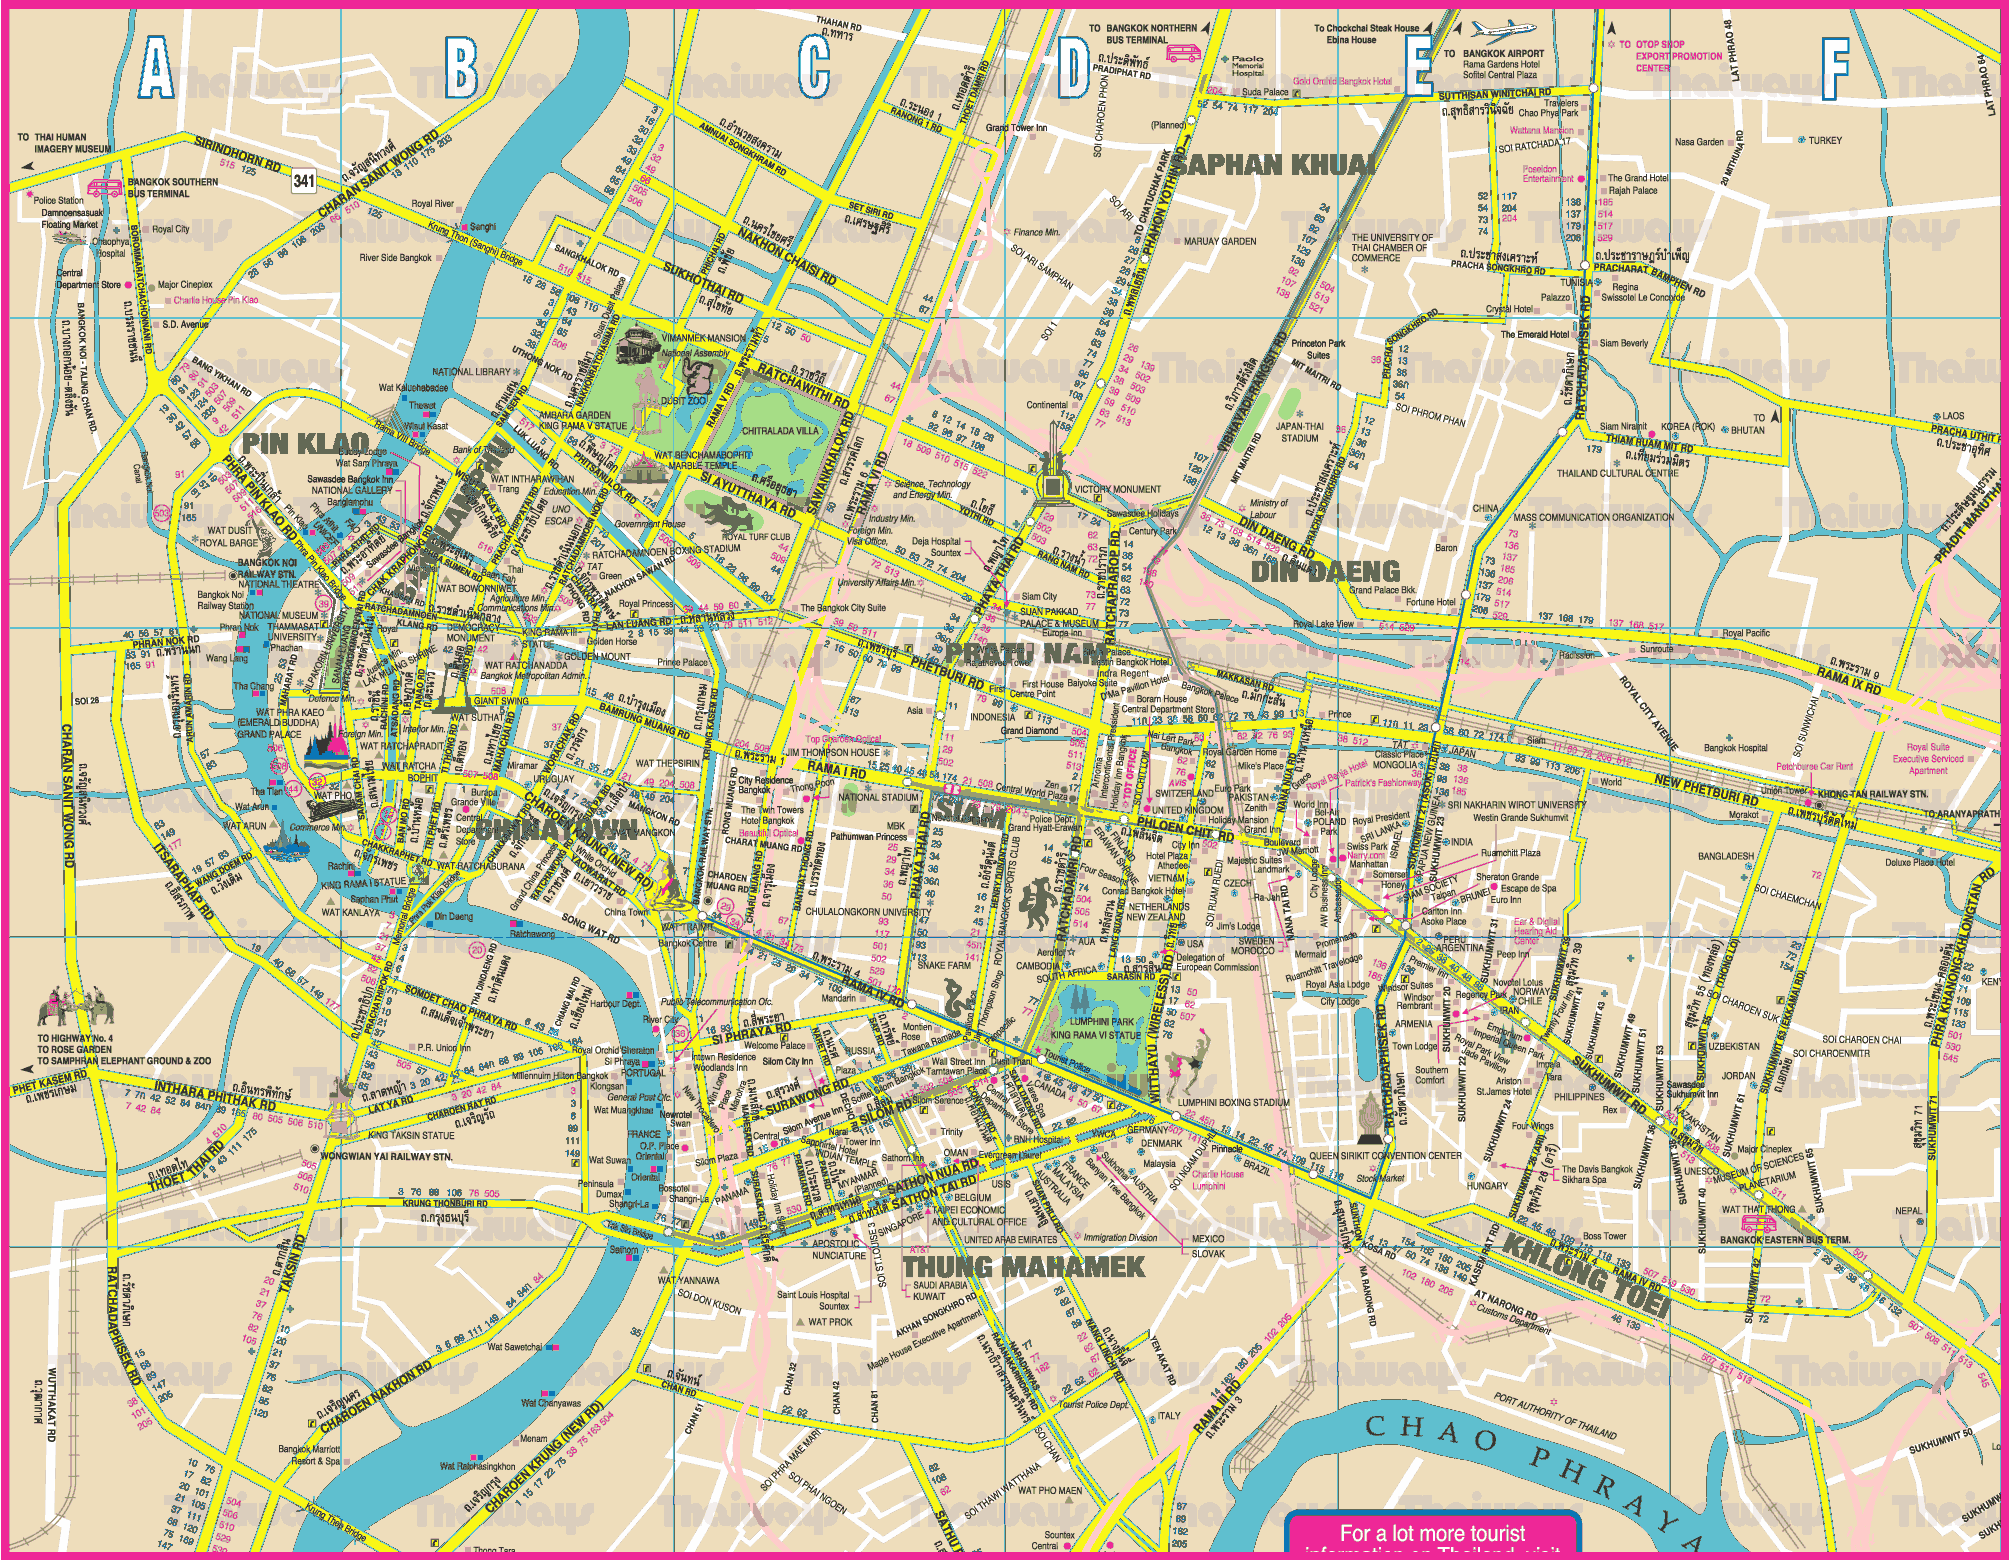 Bangkok Map - Detailed City and Metro Maps of Bangkok for Download ...